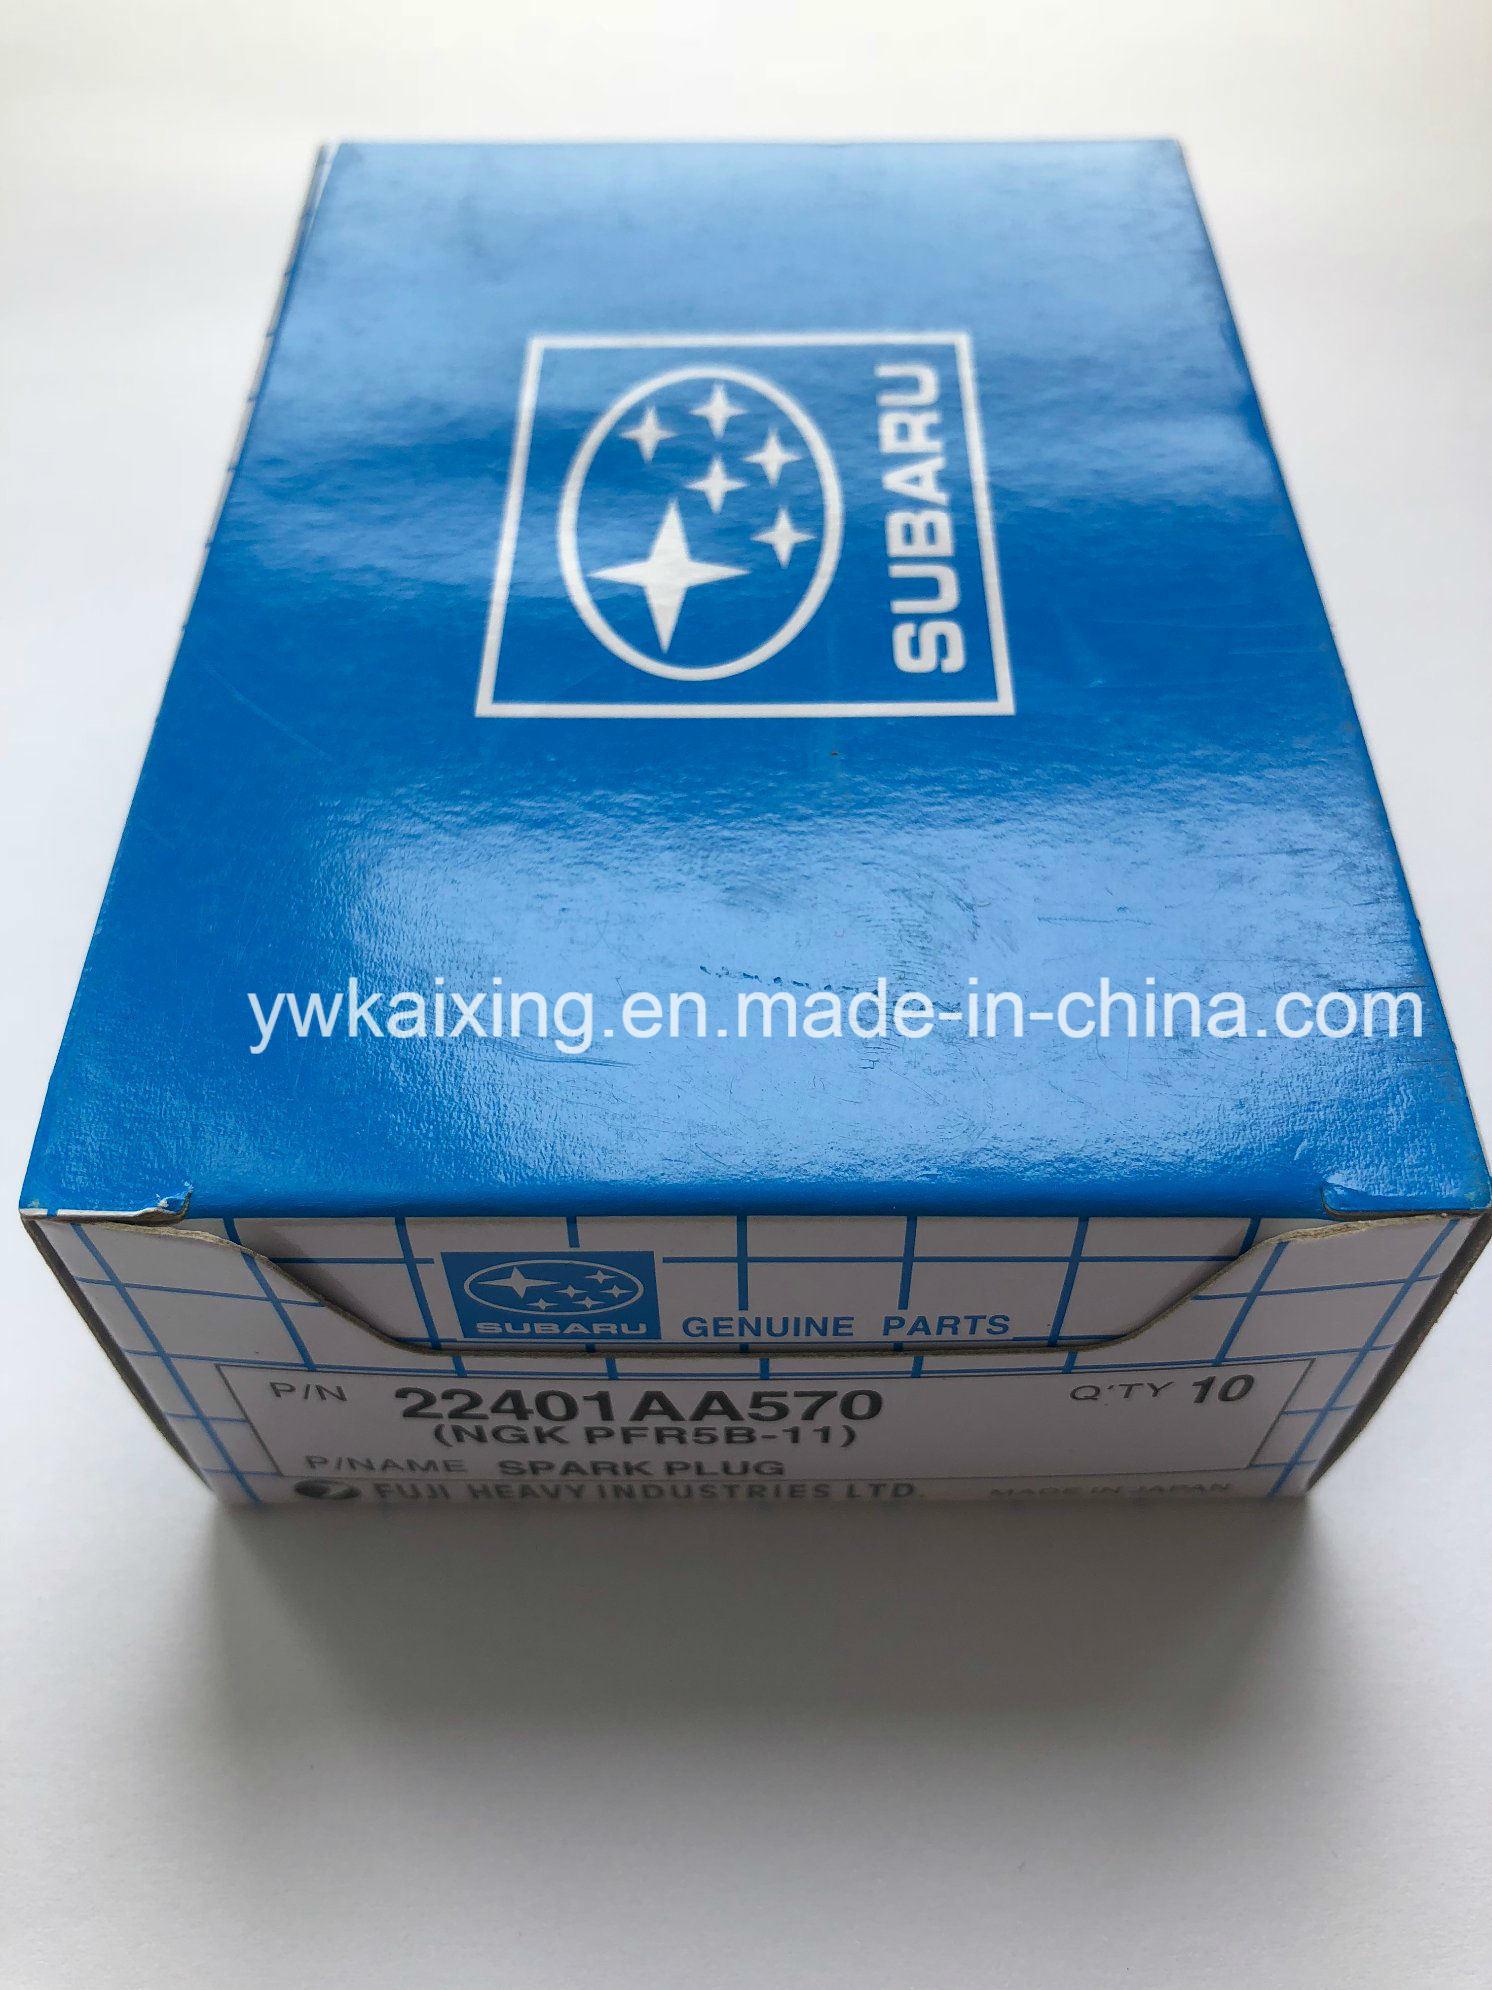 China Ngk Pfr5b 11 Spark Plug For Subaru Forester Impreza Legacy 2000 Wires Nissan 22401 Aa570